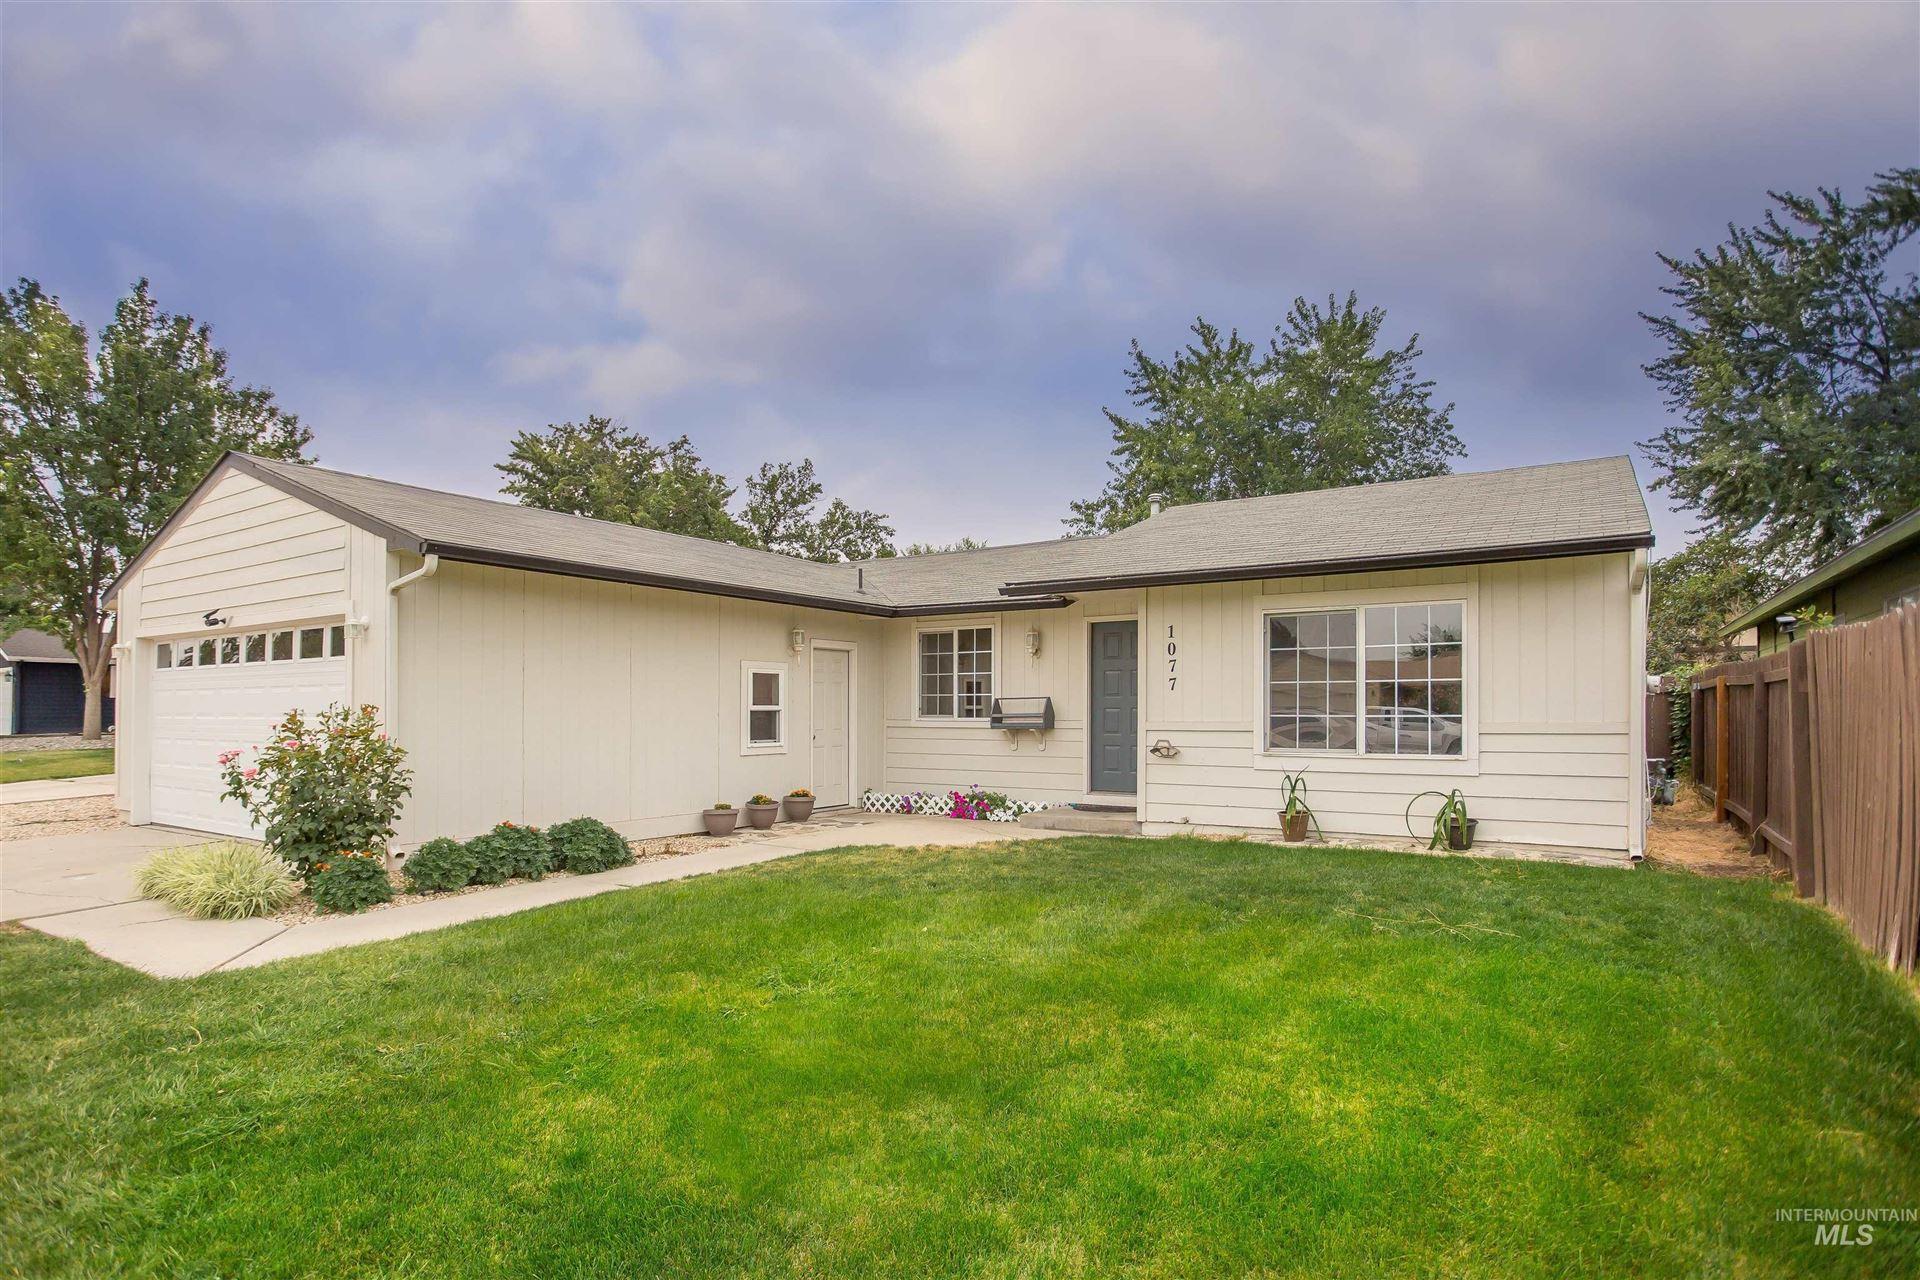 1077 W Fairwood Ct, Meridian, ID 83646 - MLS#: 98815594